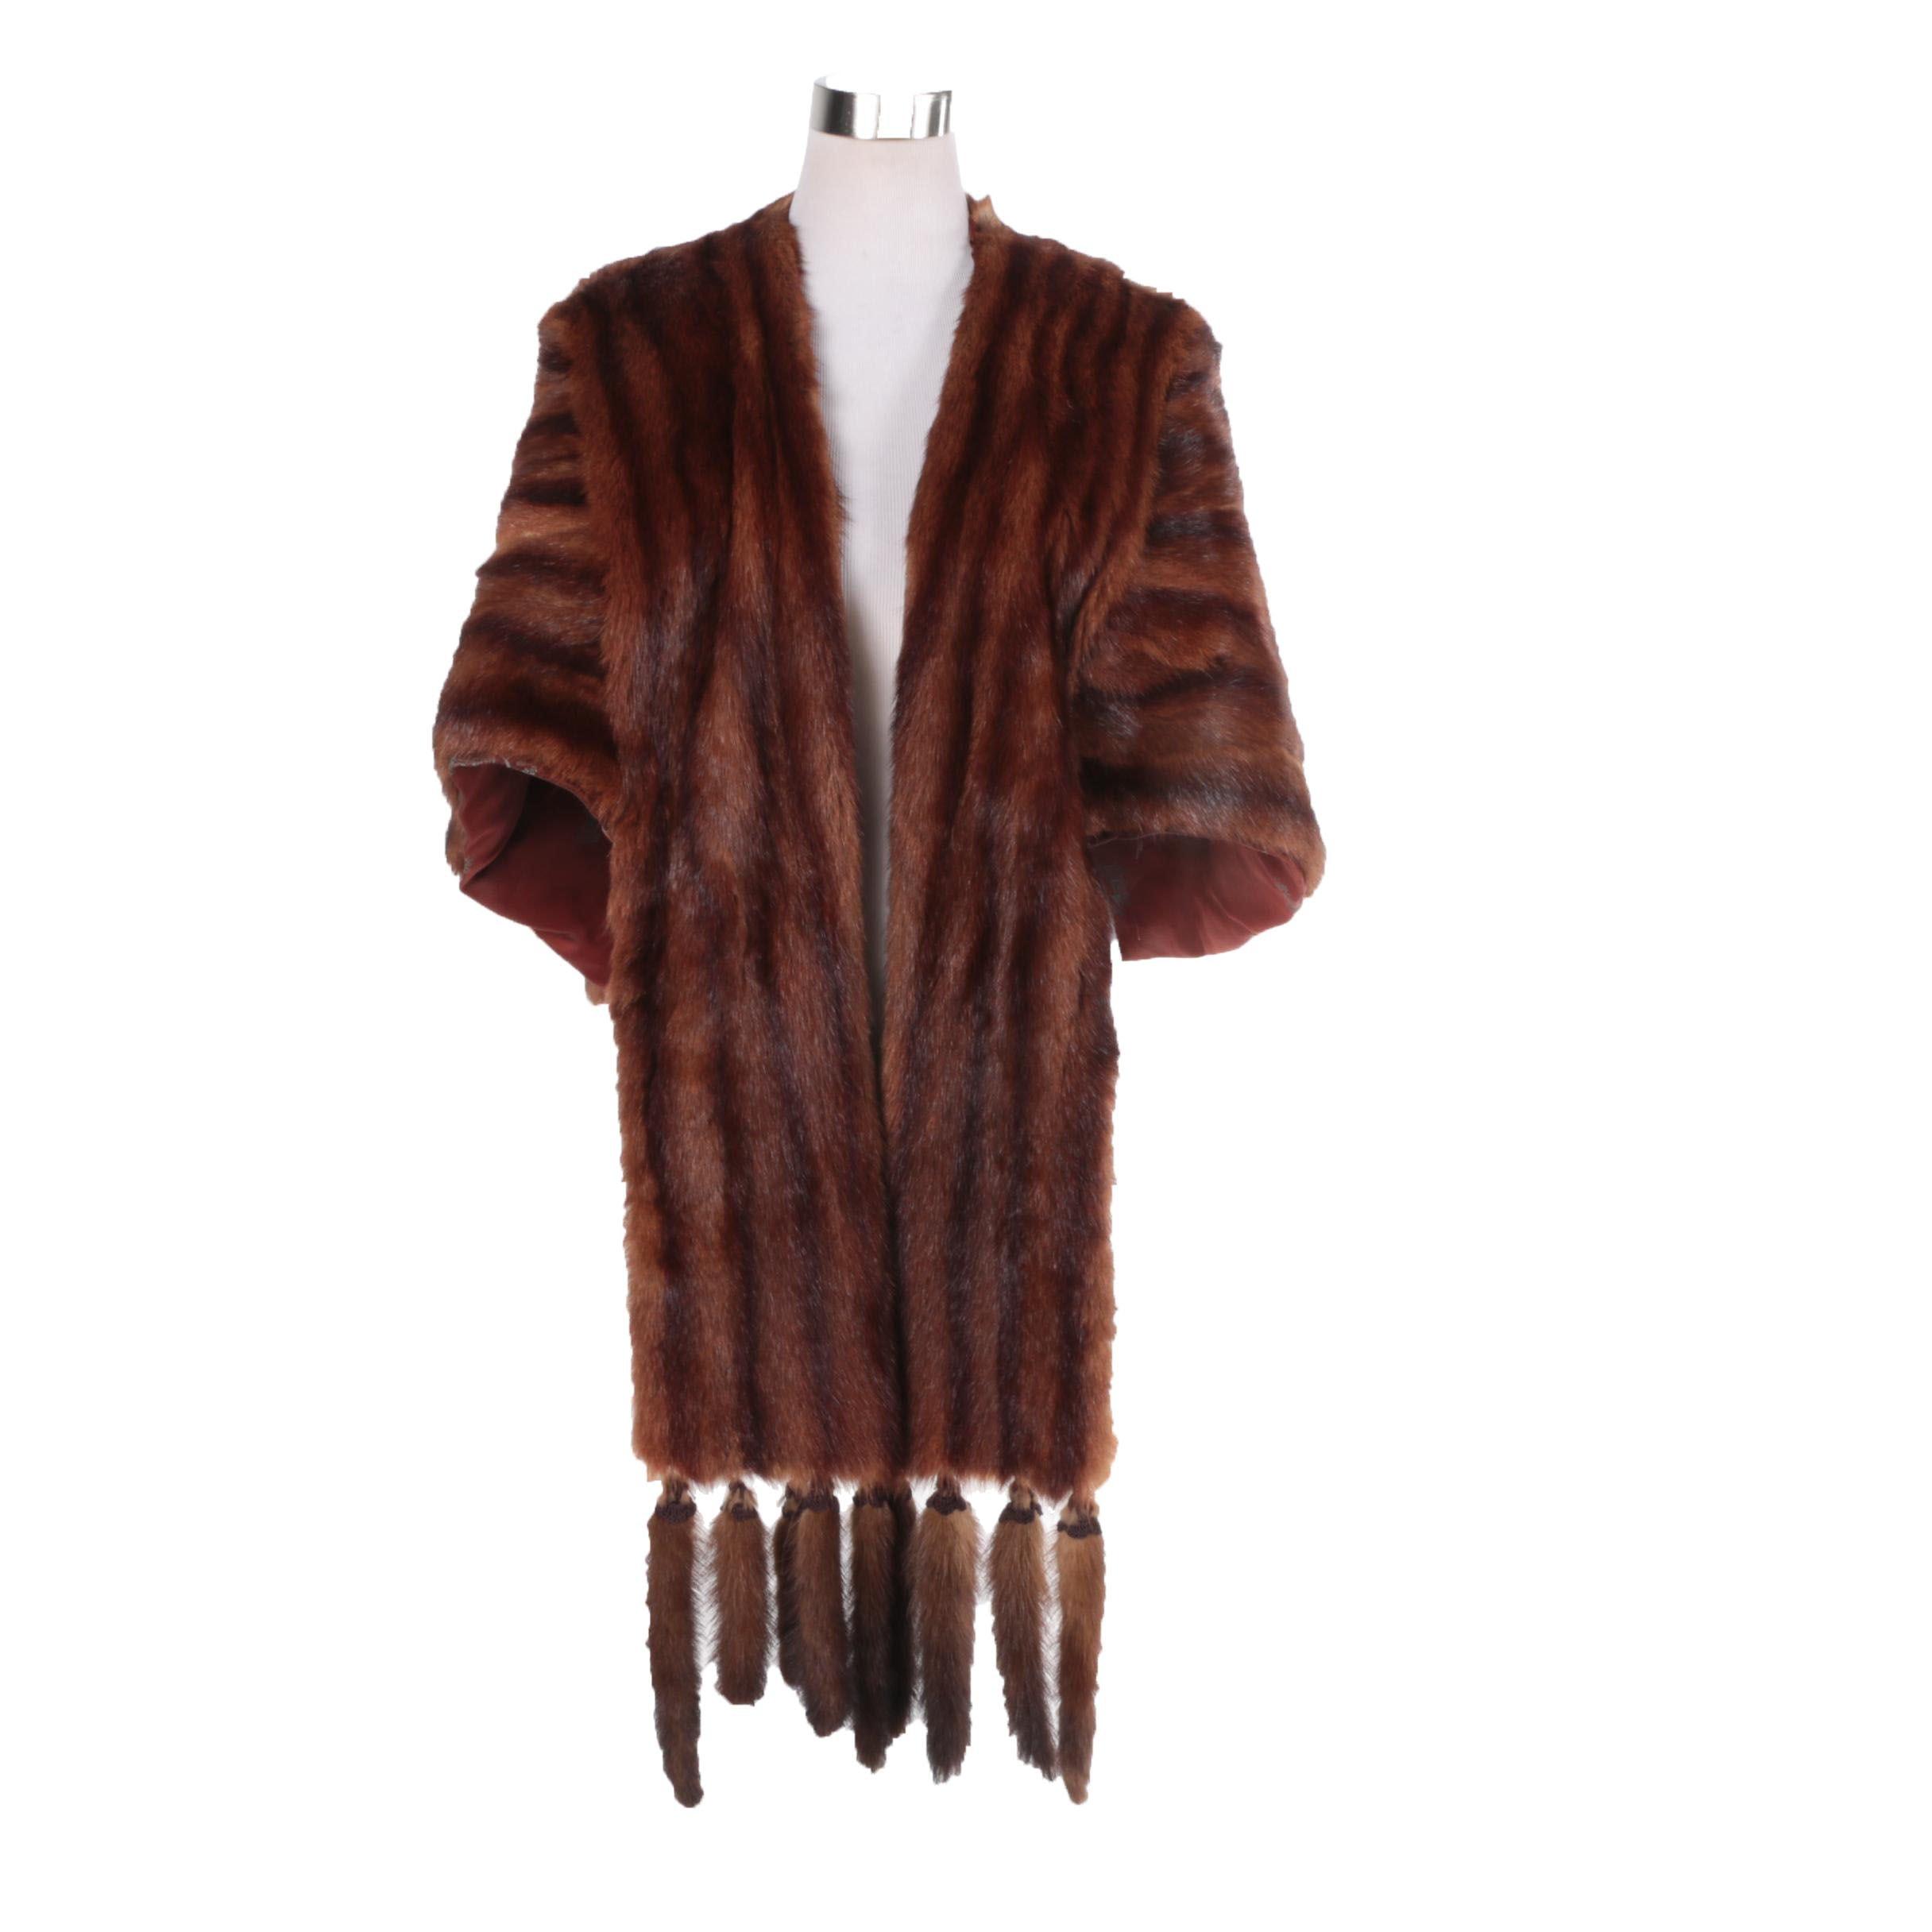 Vintage Joslin's Marmot Fur Stole